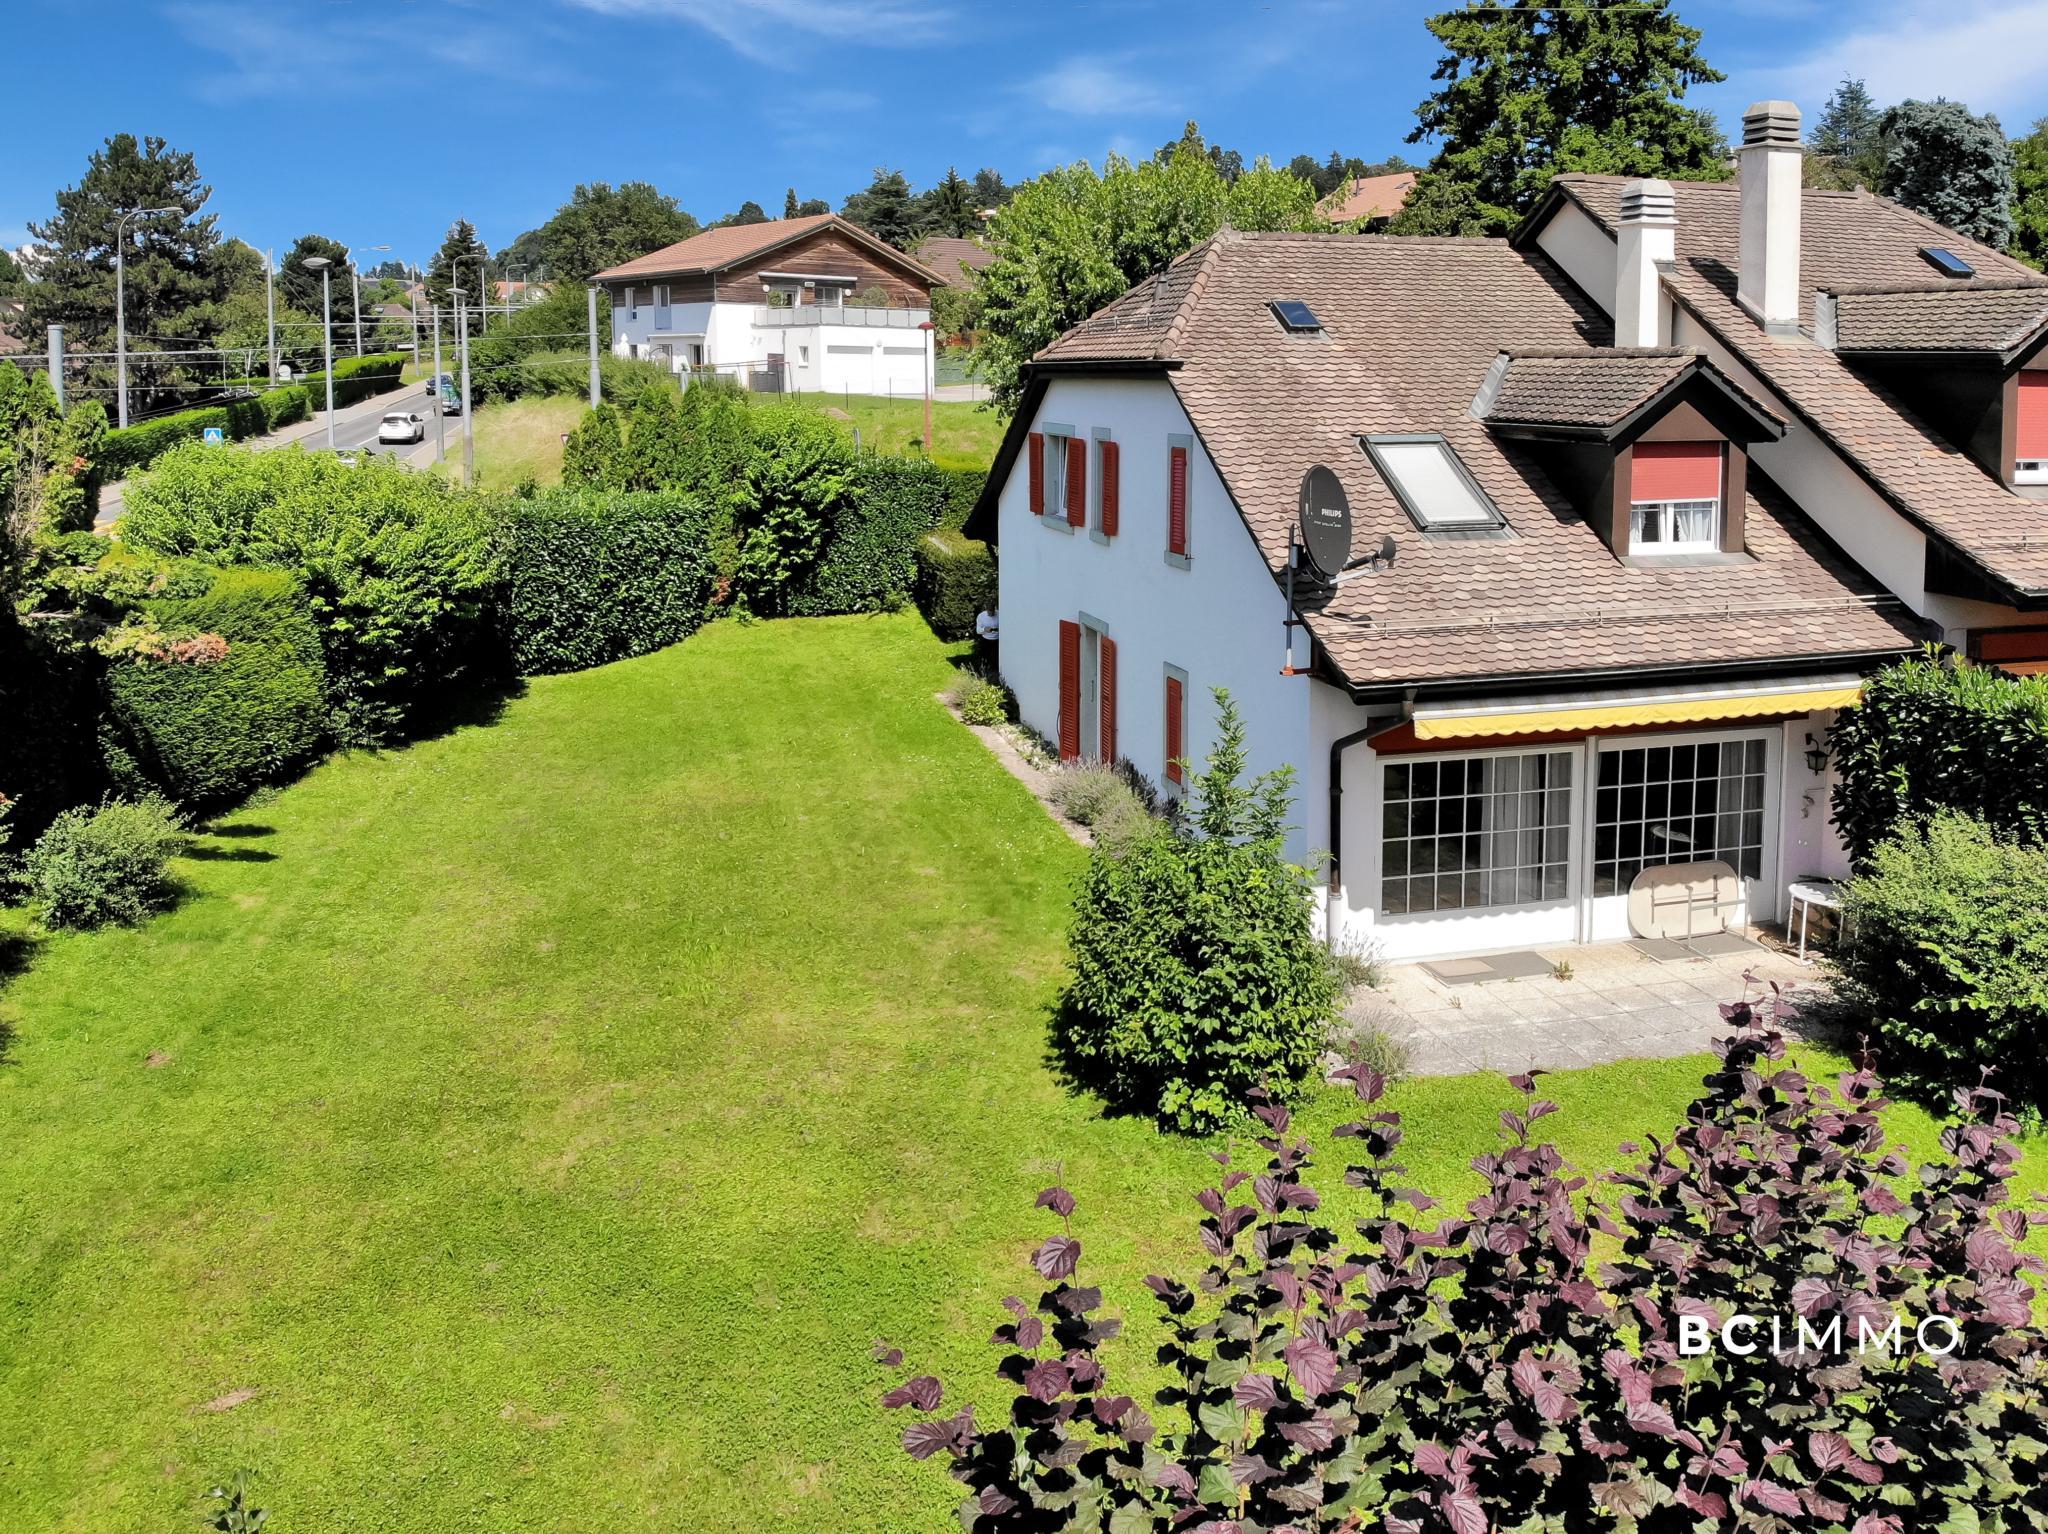 BC Immo - Villa mitoyenne idéalement située avec grand jardin - 1052SB1